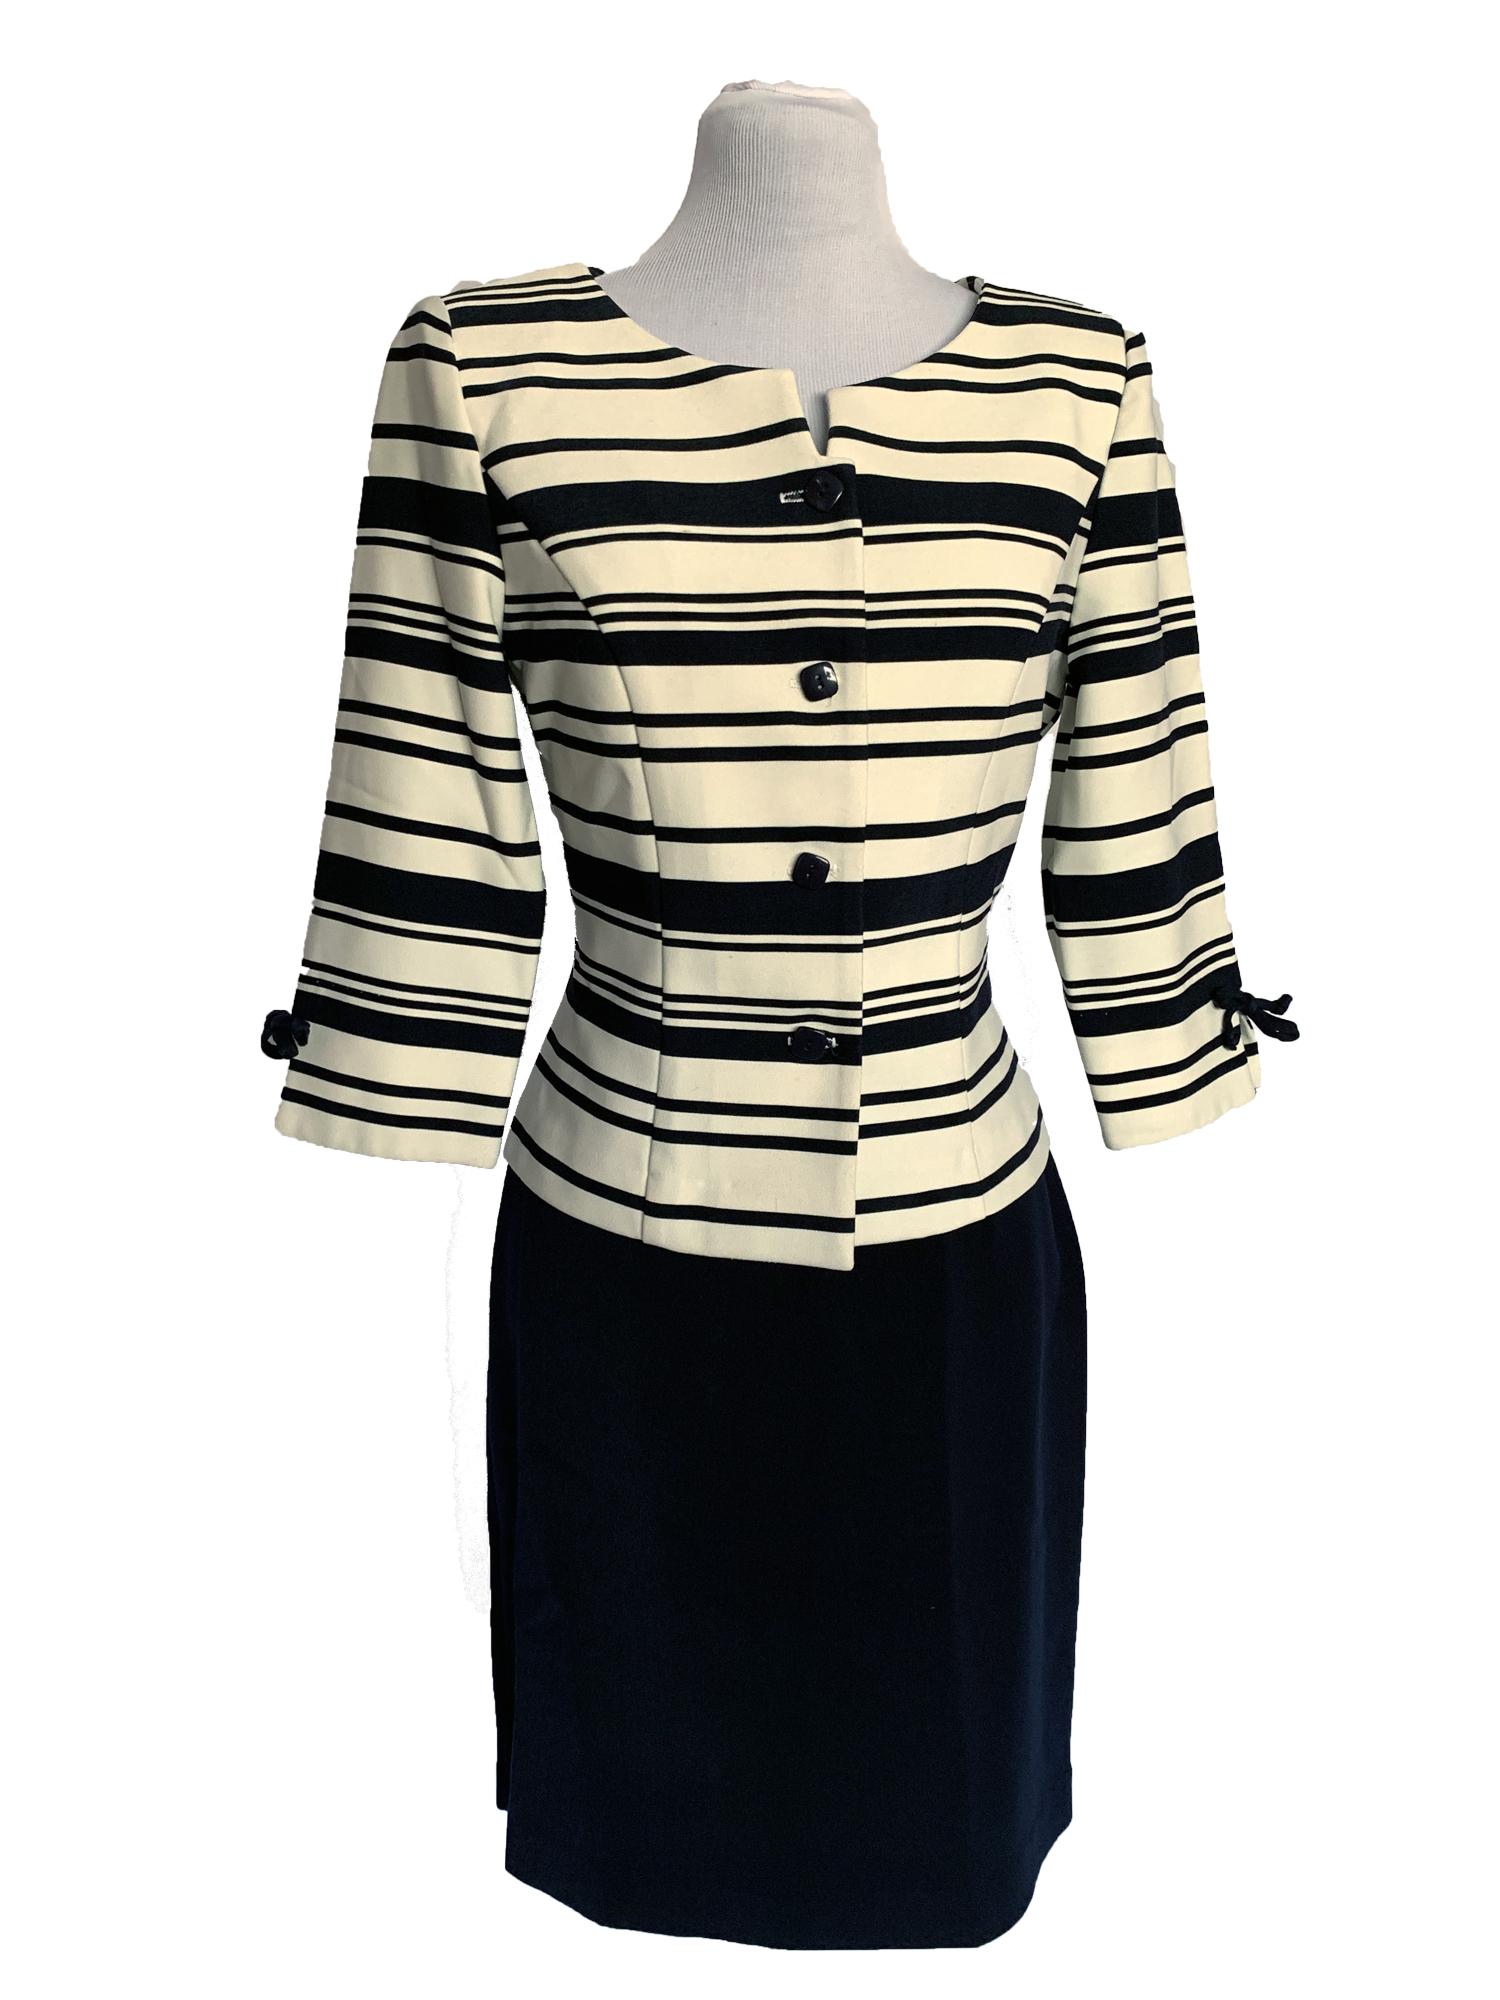 674da7f1a37fc Jessica Howard Skirt Suit l Size 4P — Second Hand Swank